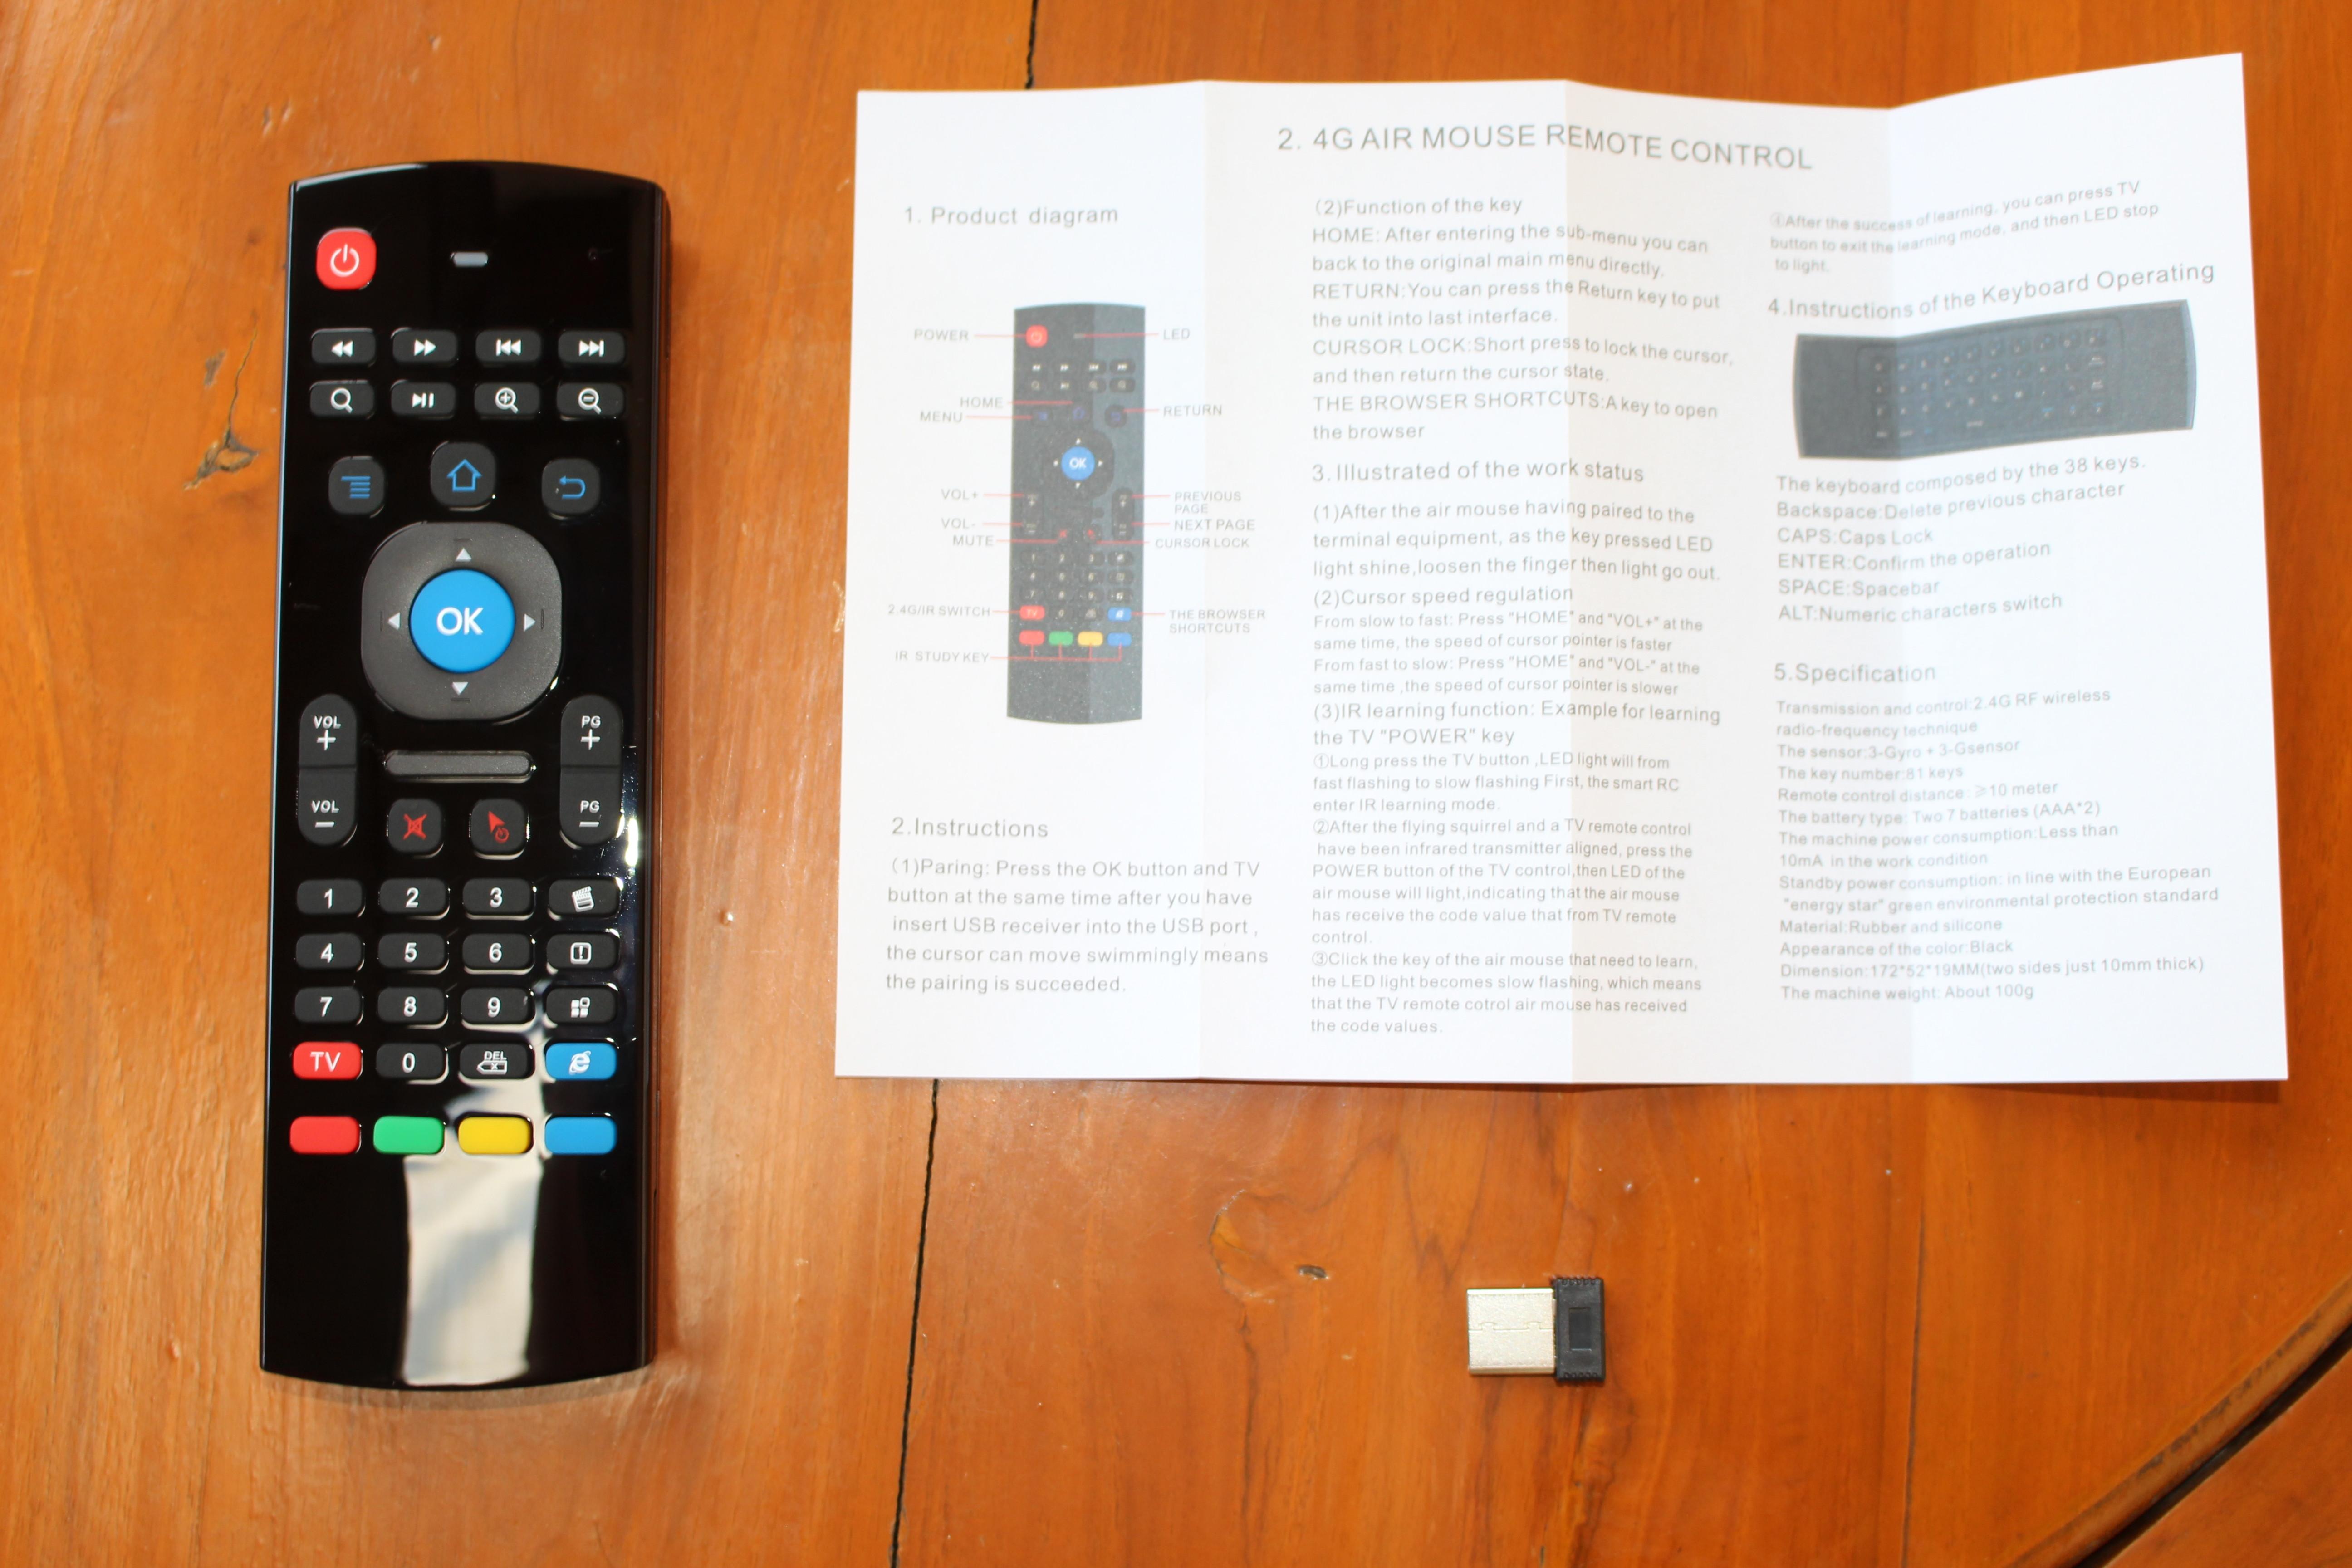 Review of Ebox T8 V Amlogic S912 TV Box with SATA Bay - Part